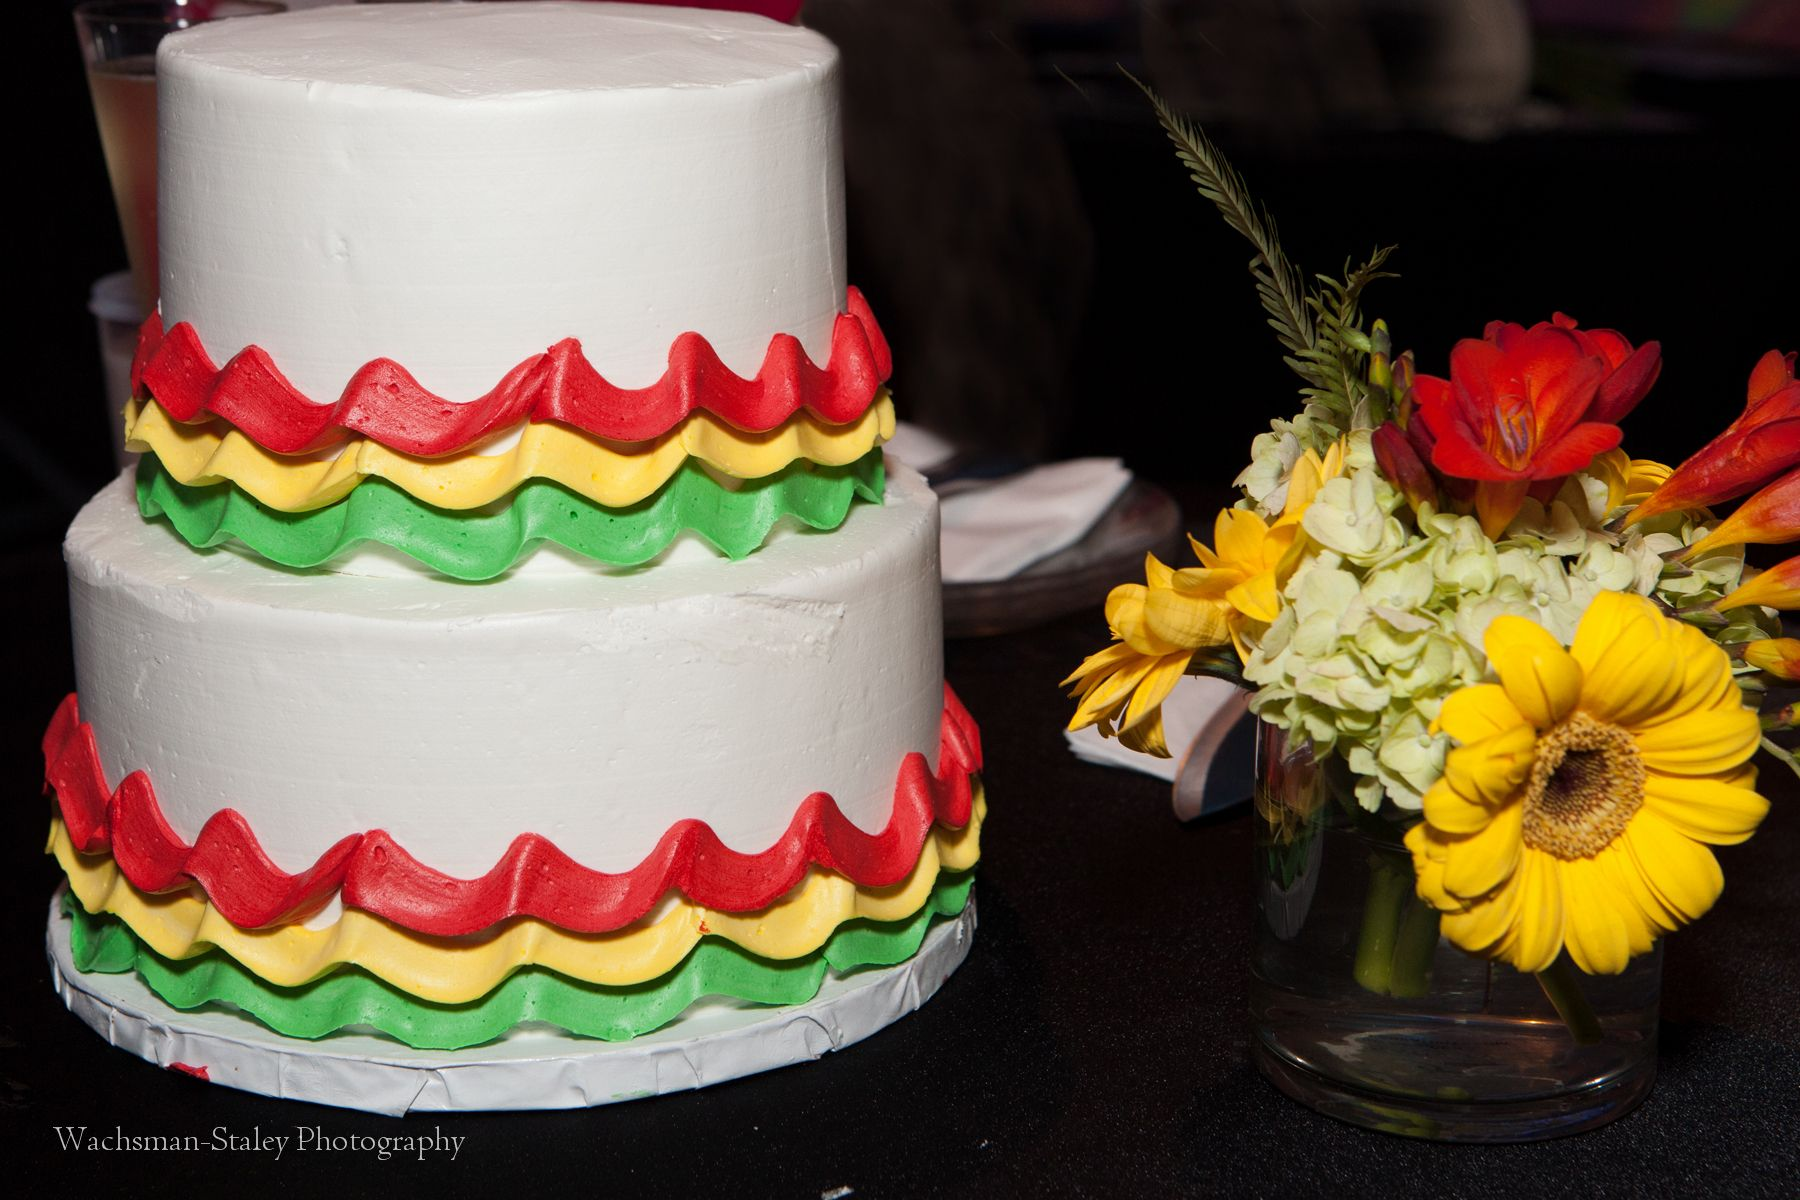 Bob marley - Hard Rock - Red - Green - Yellow - Wedding - Design by DB Creativity - PC: Wachsman-Staley Photography